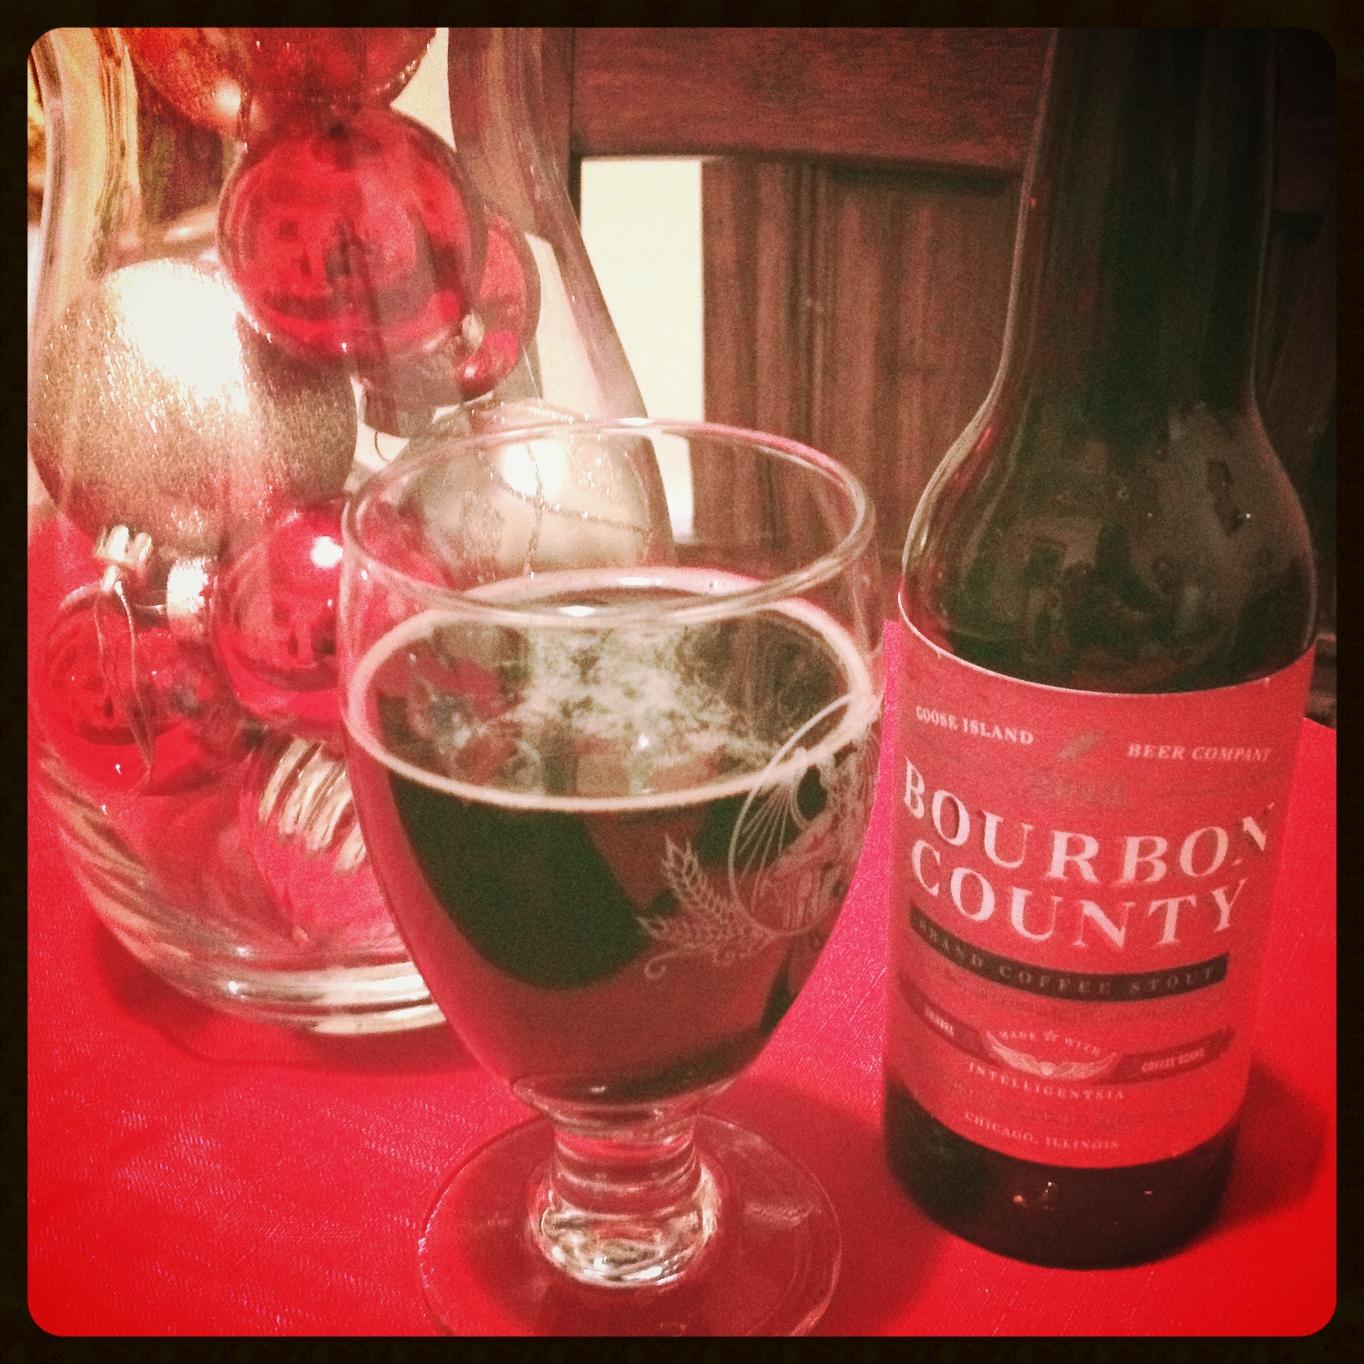 Bourbon County Brand Coffee Stout (2014 Vintage)